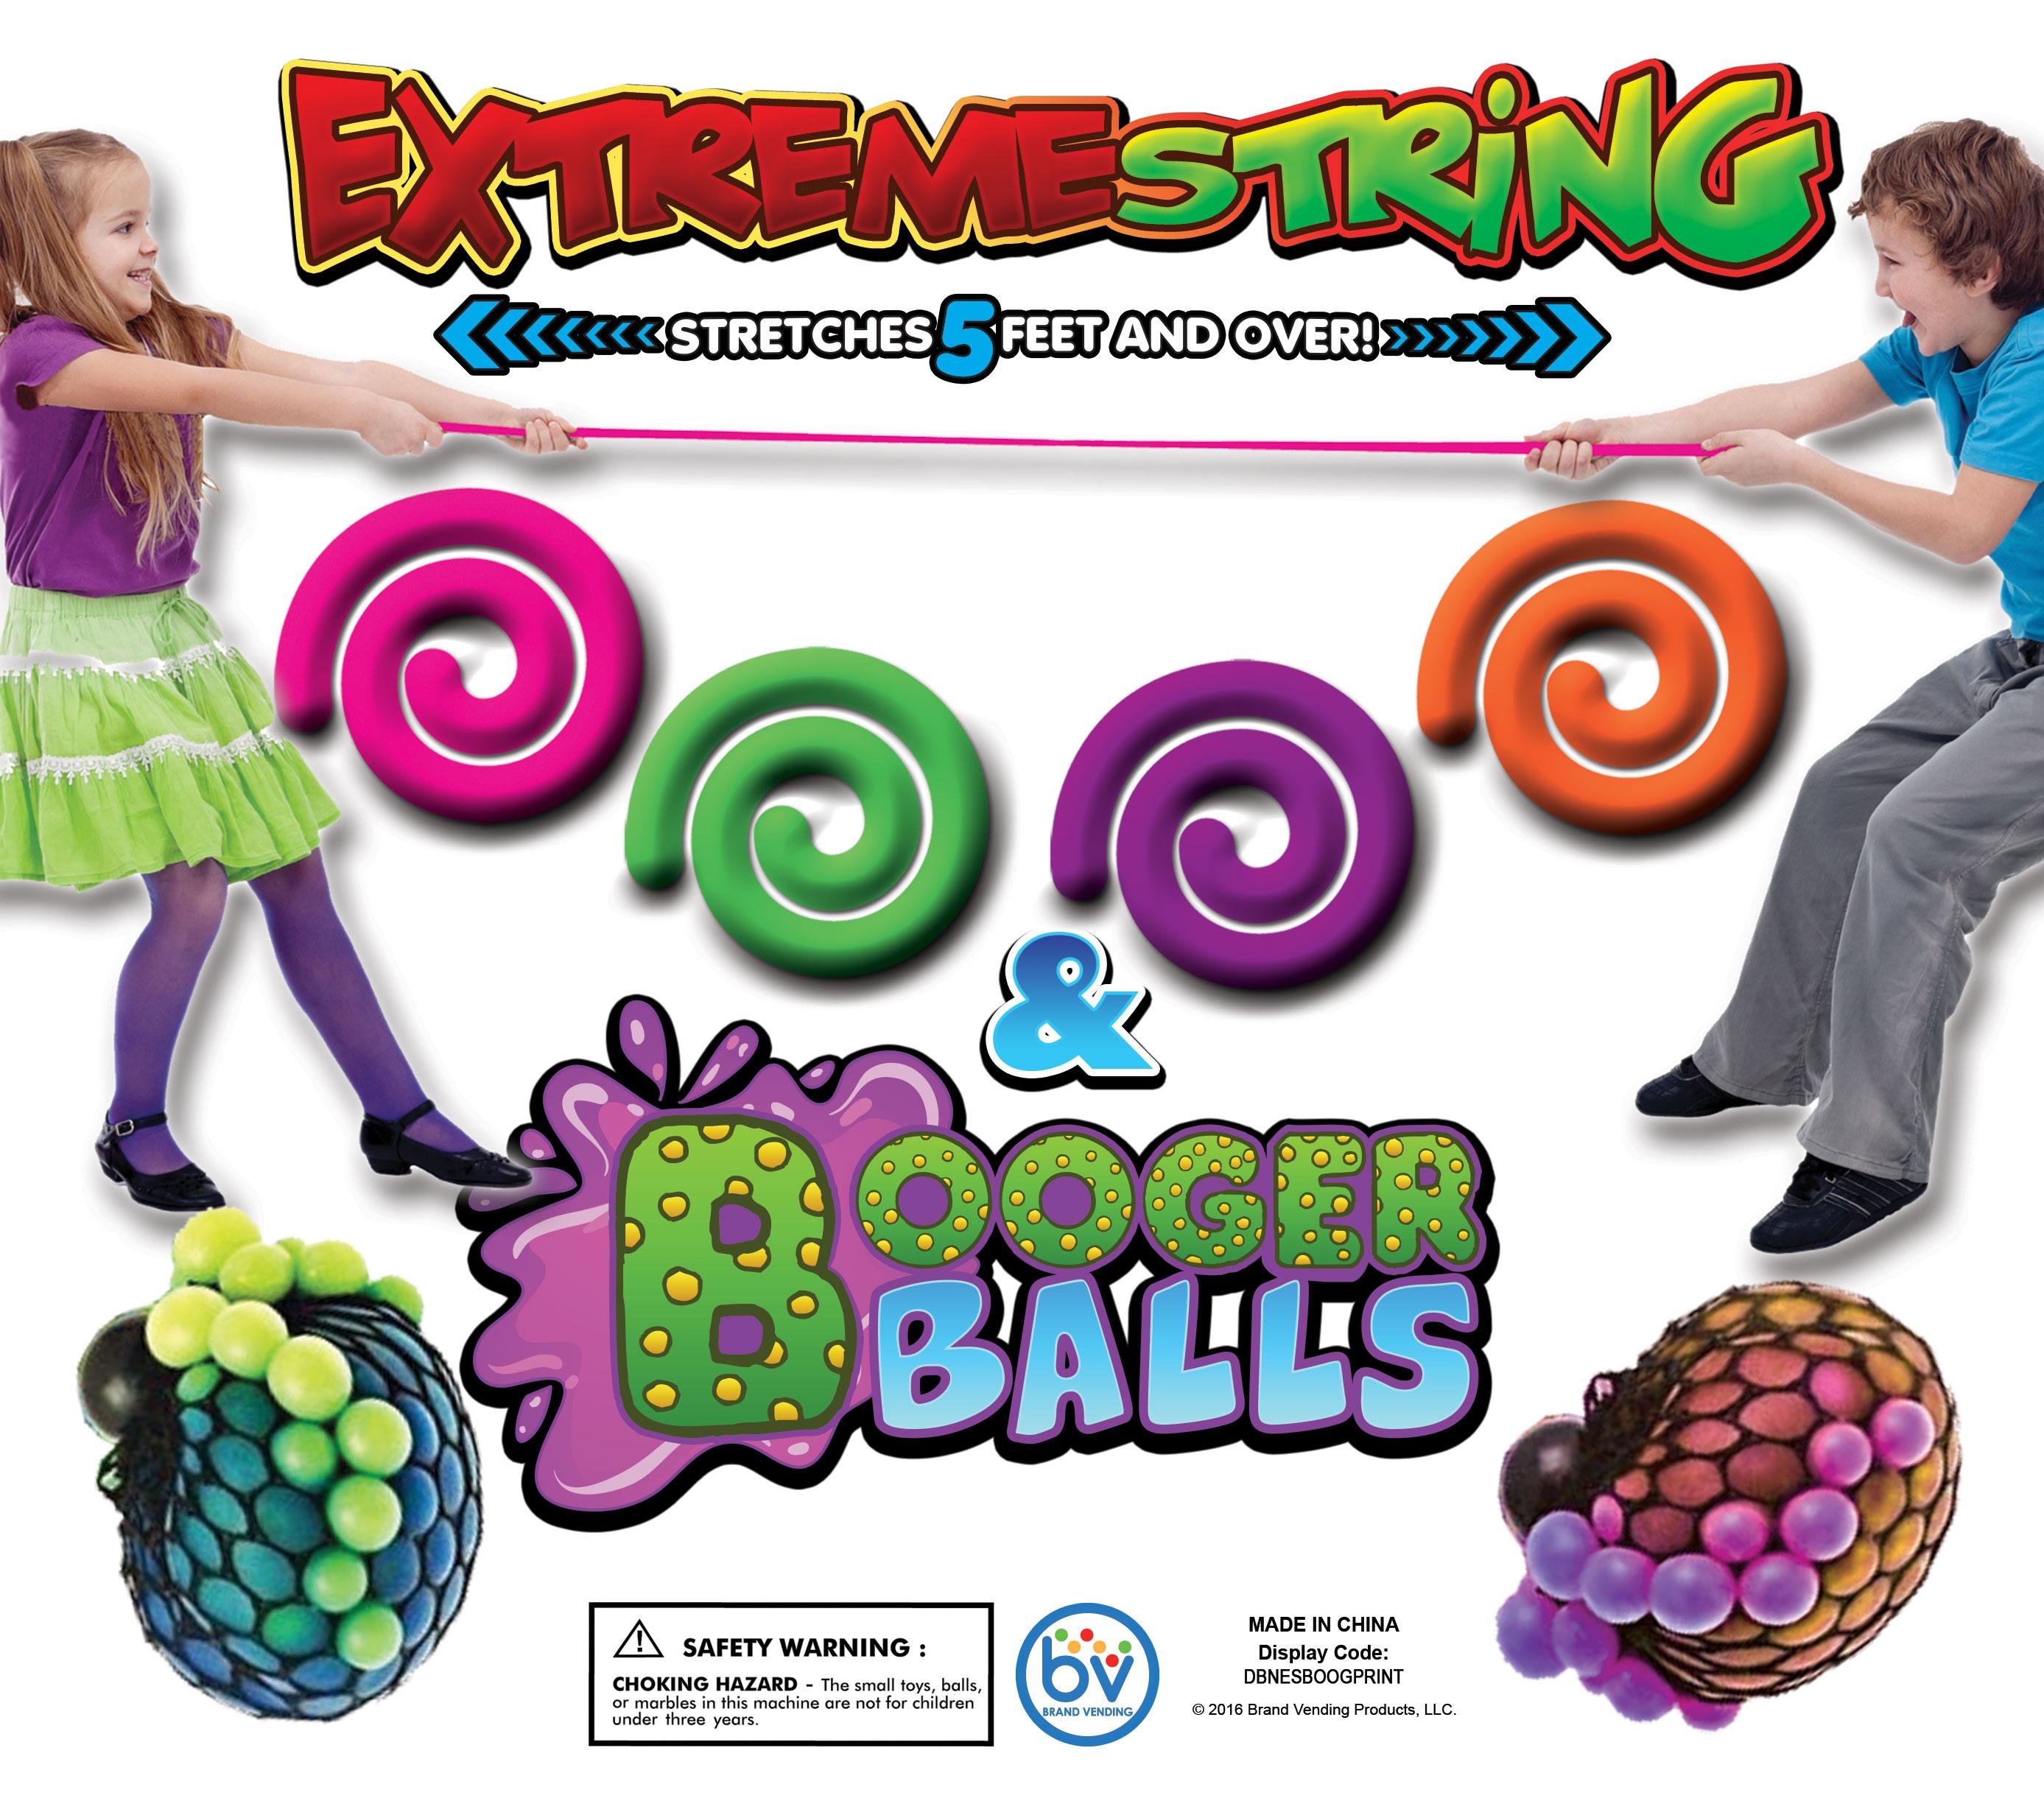 BoogerBallsExtremeStringDisplay1